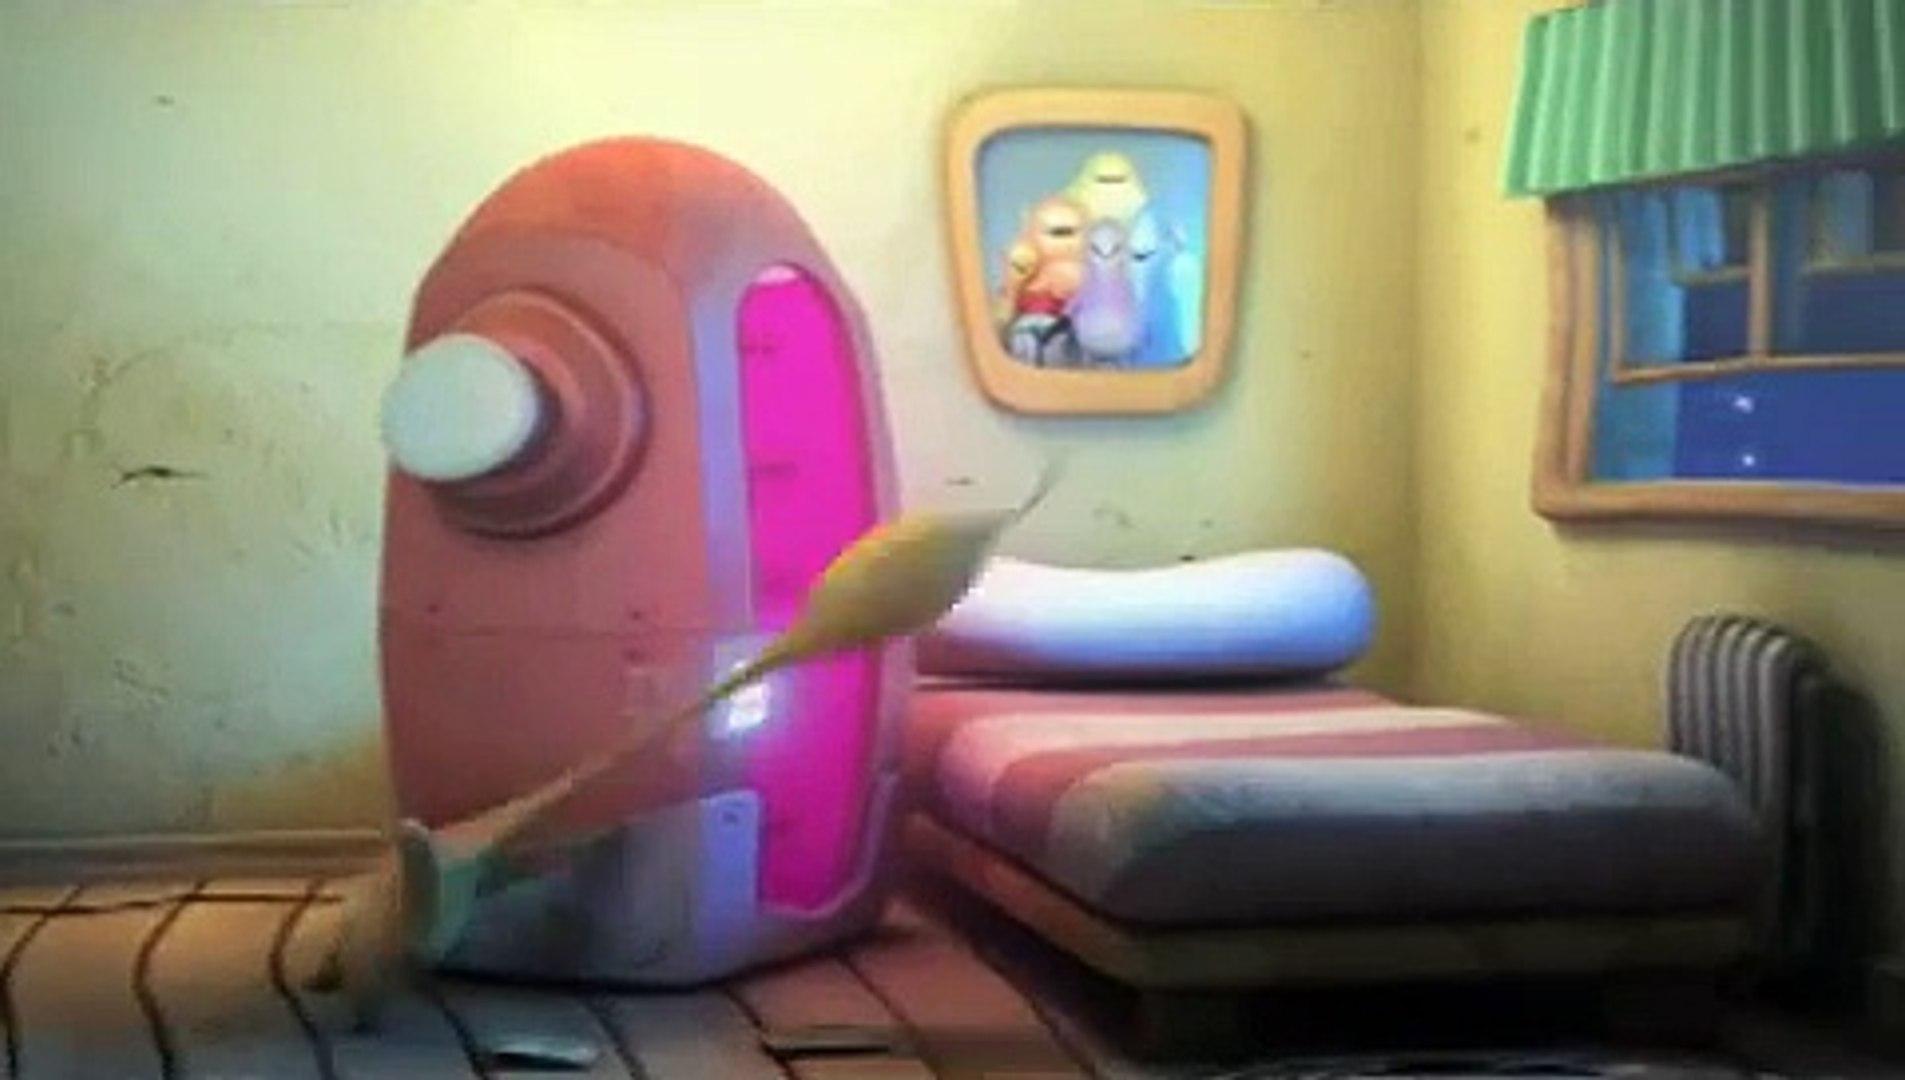 Glumpers, funny cartoon videos in youtube Teletransport Remix, kids entertainment